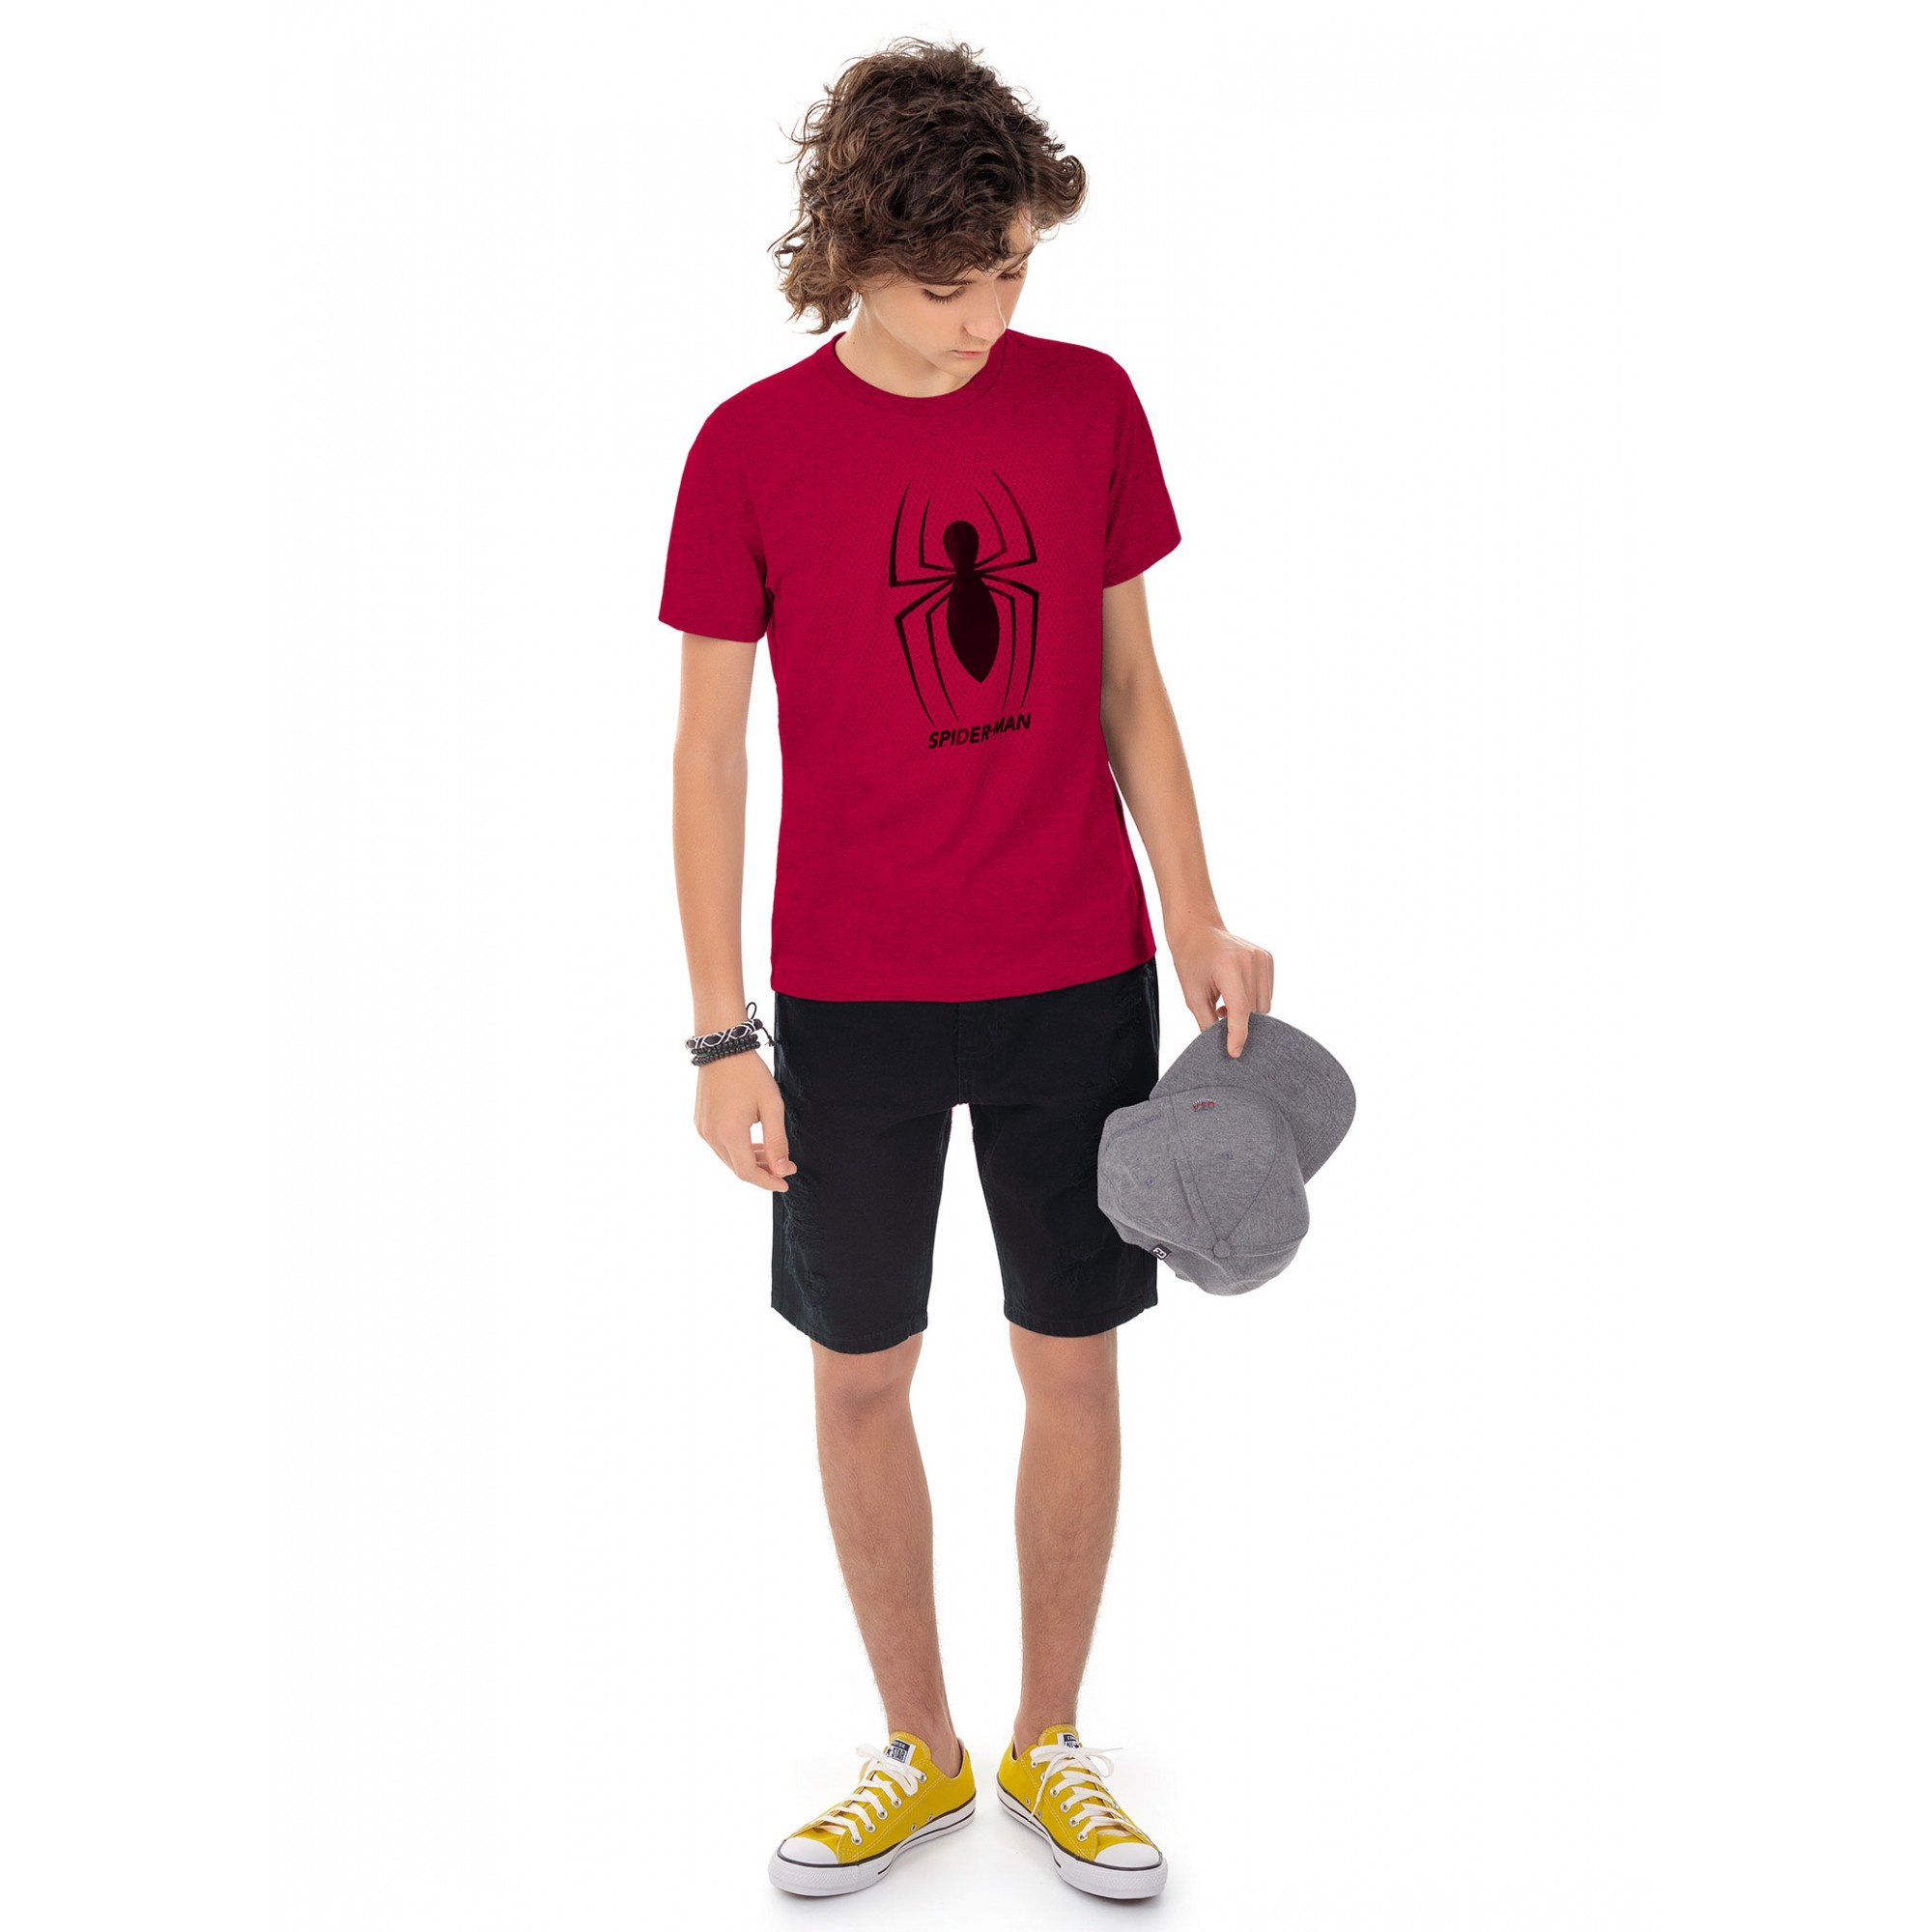 Camiseta Teen Masculina Verão Vermelha Spiderman Cativa